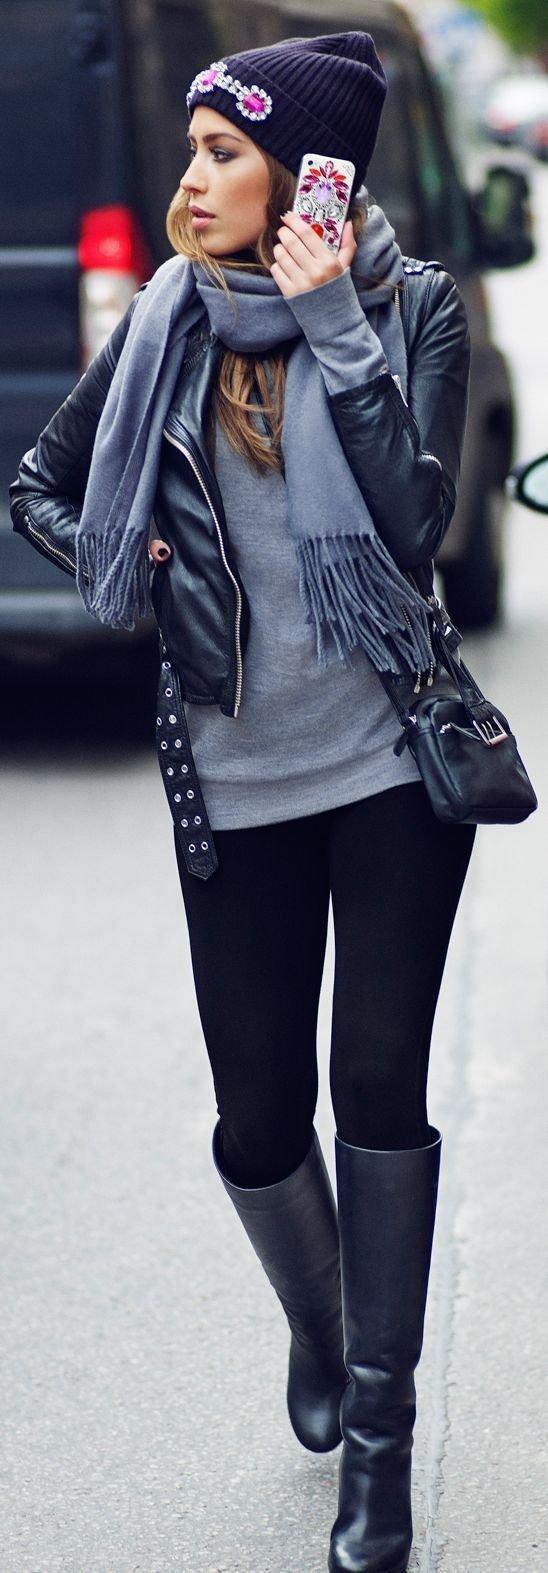 footwear,black,clothing,lady,cap,